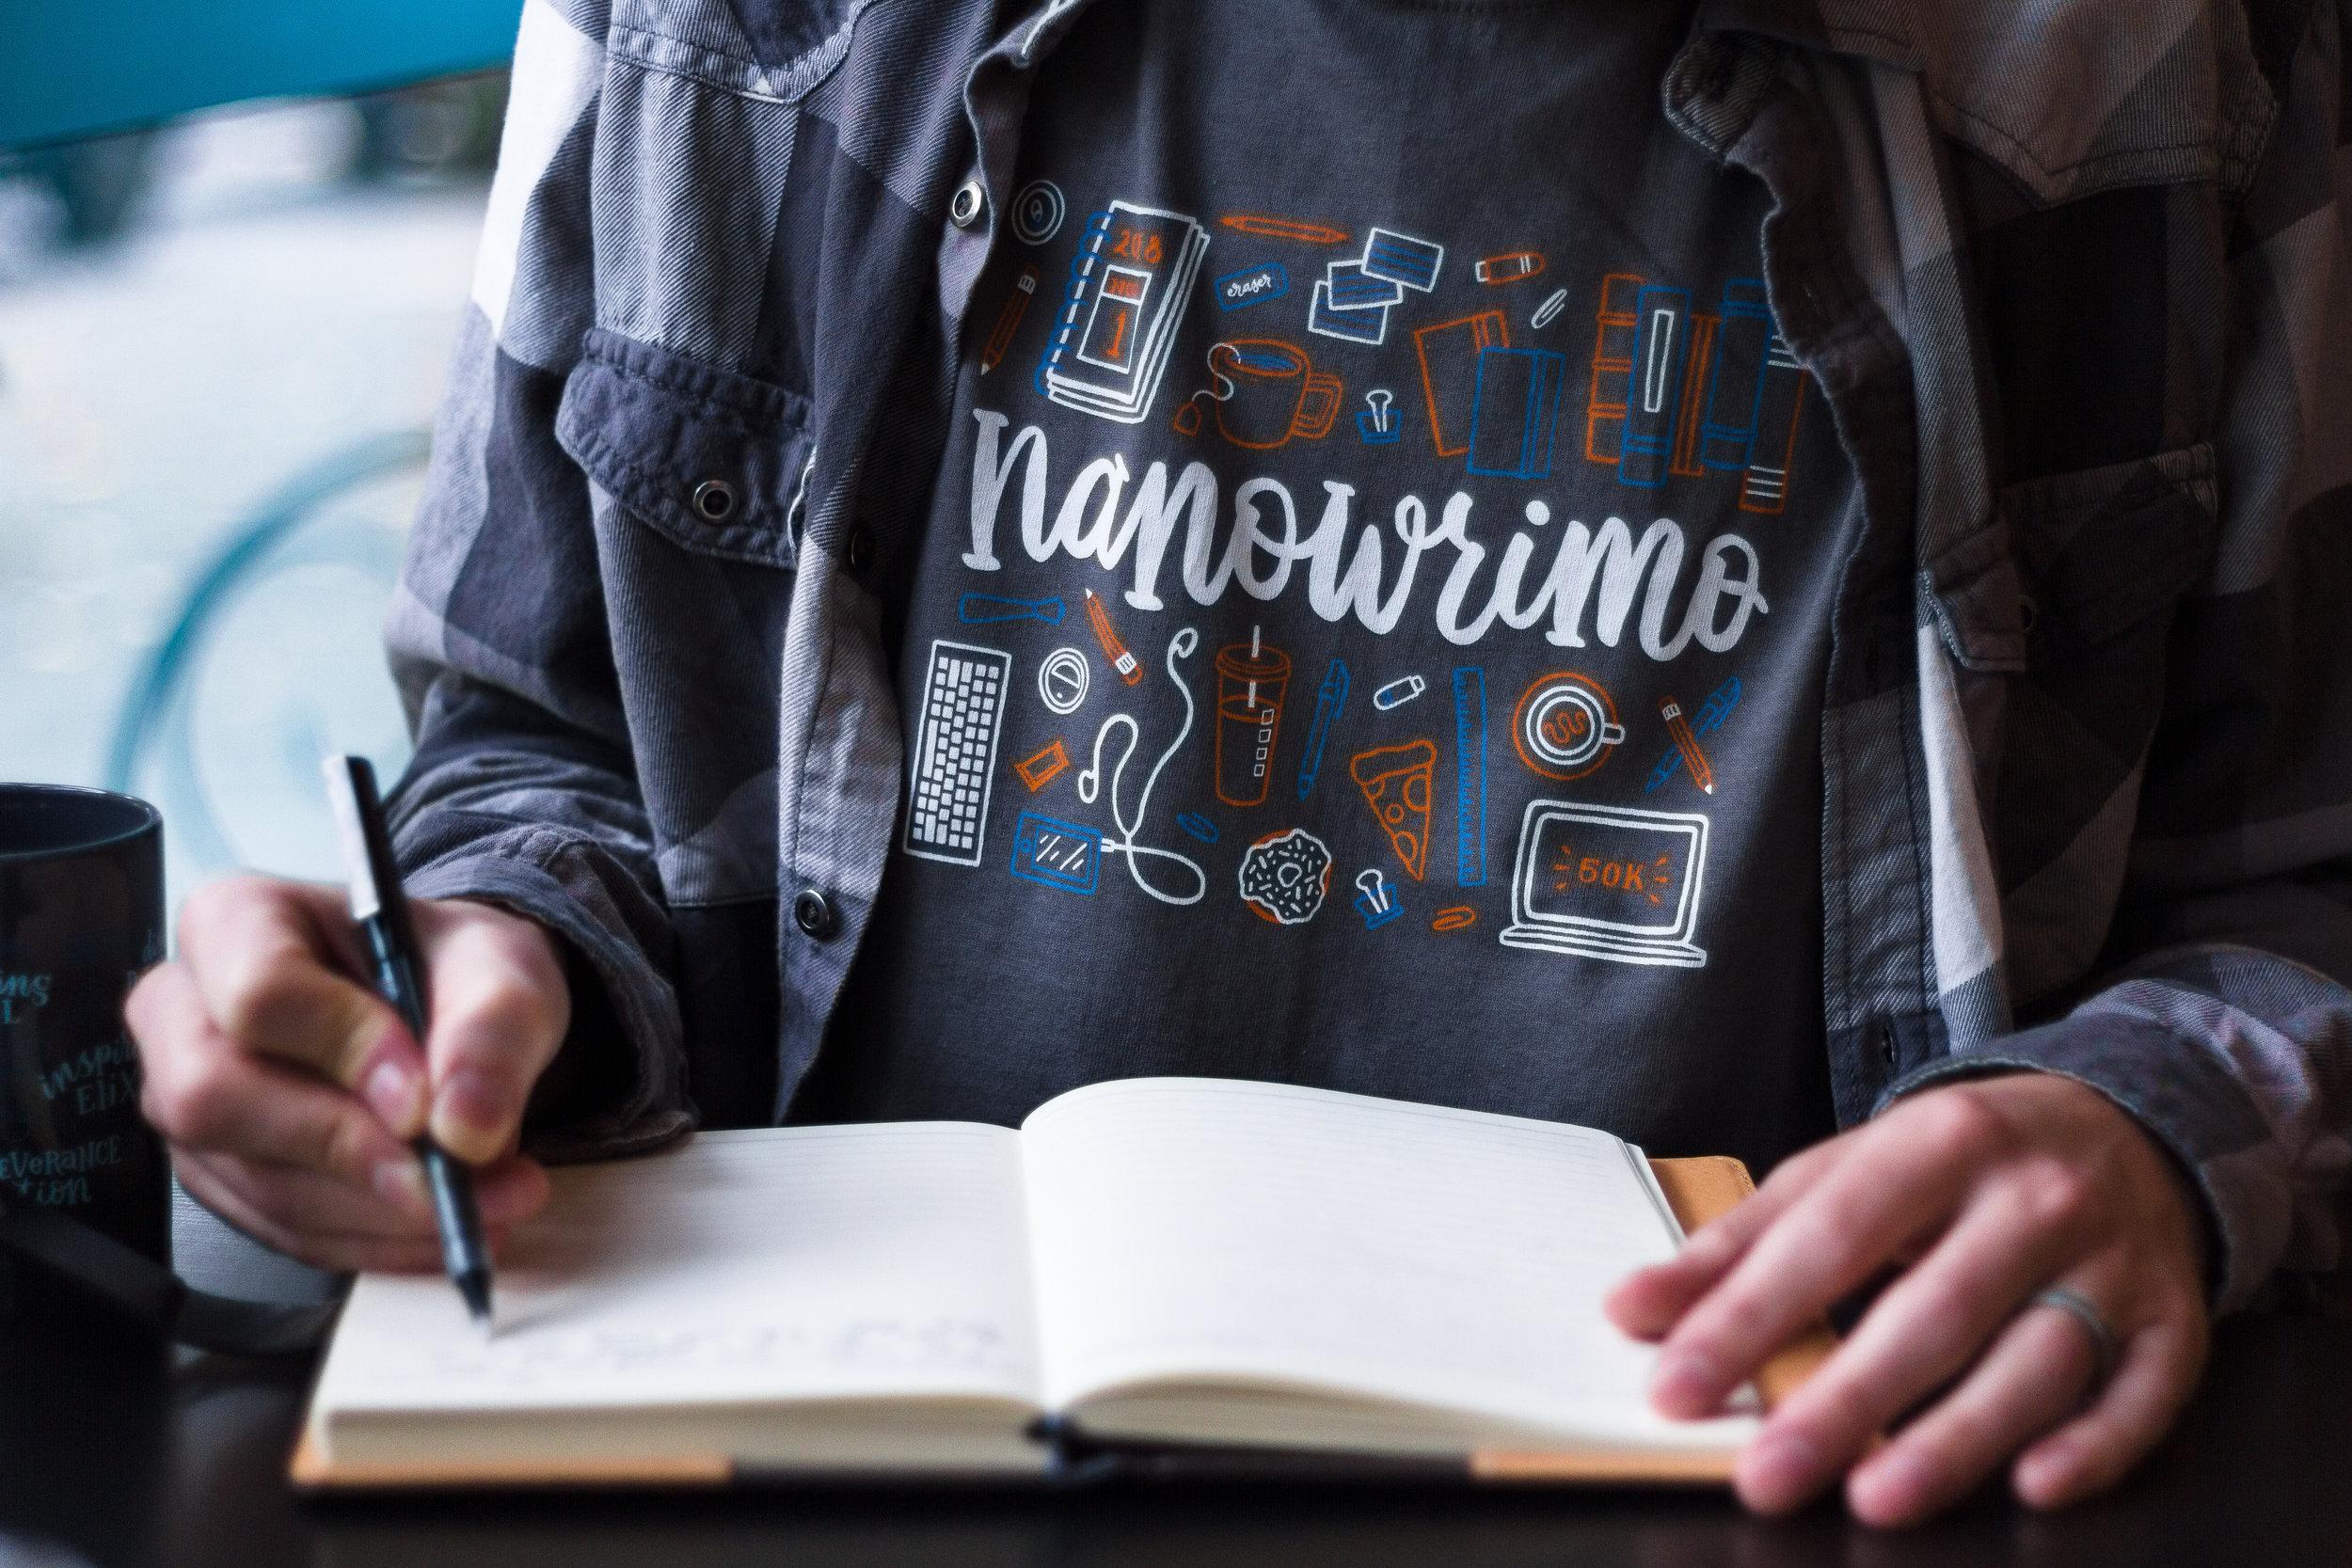 National Novel Writing Month t-shirt